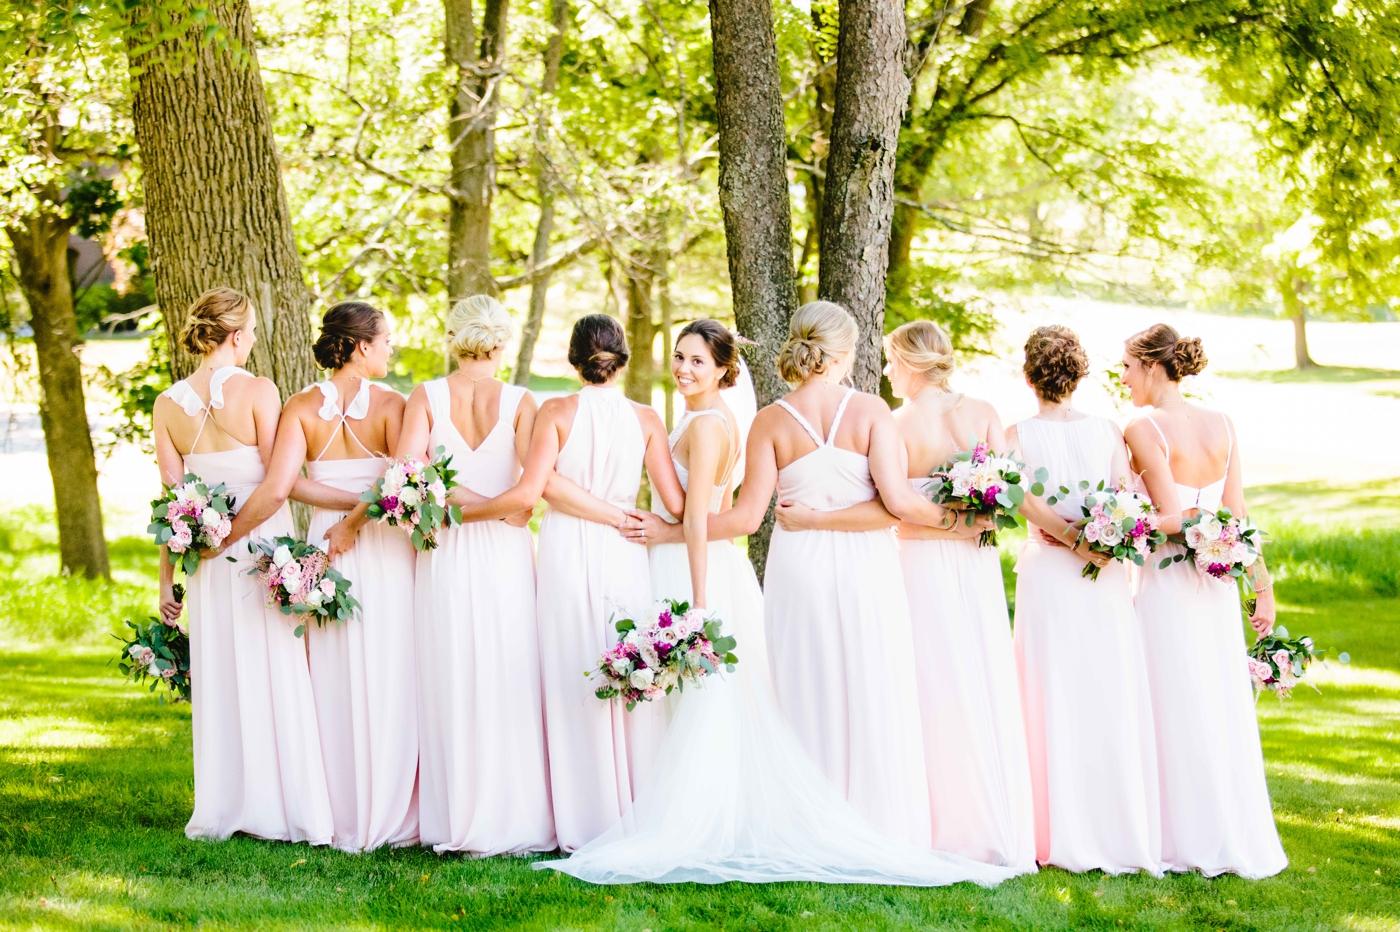 chicago-fine-art-wedding-photography-tyma14